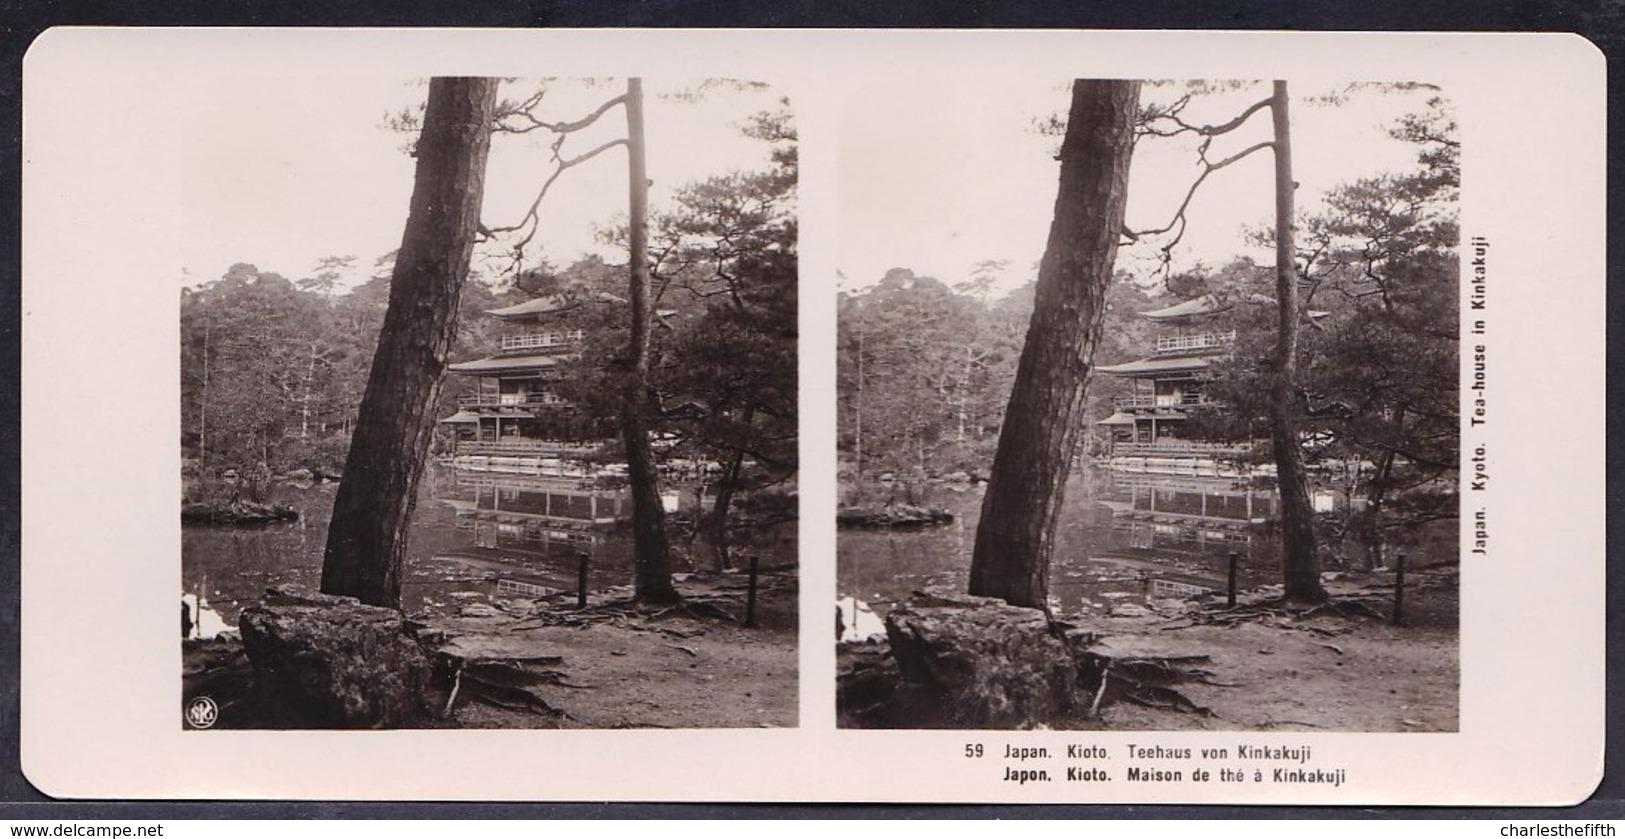 STEREOSCOPIC PHOTO STEREOSCOPIQUE ** JAPAN - KIOTO KINKAKUJI - TEA HOUSE ** - Photos